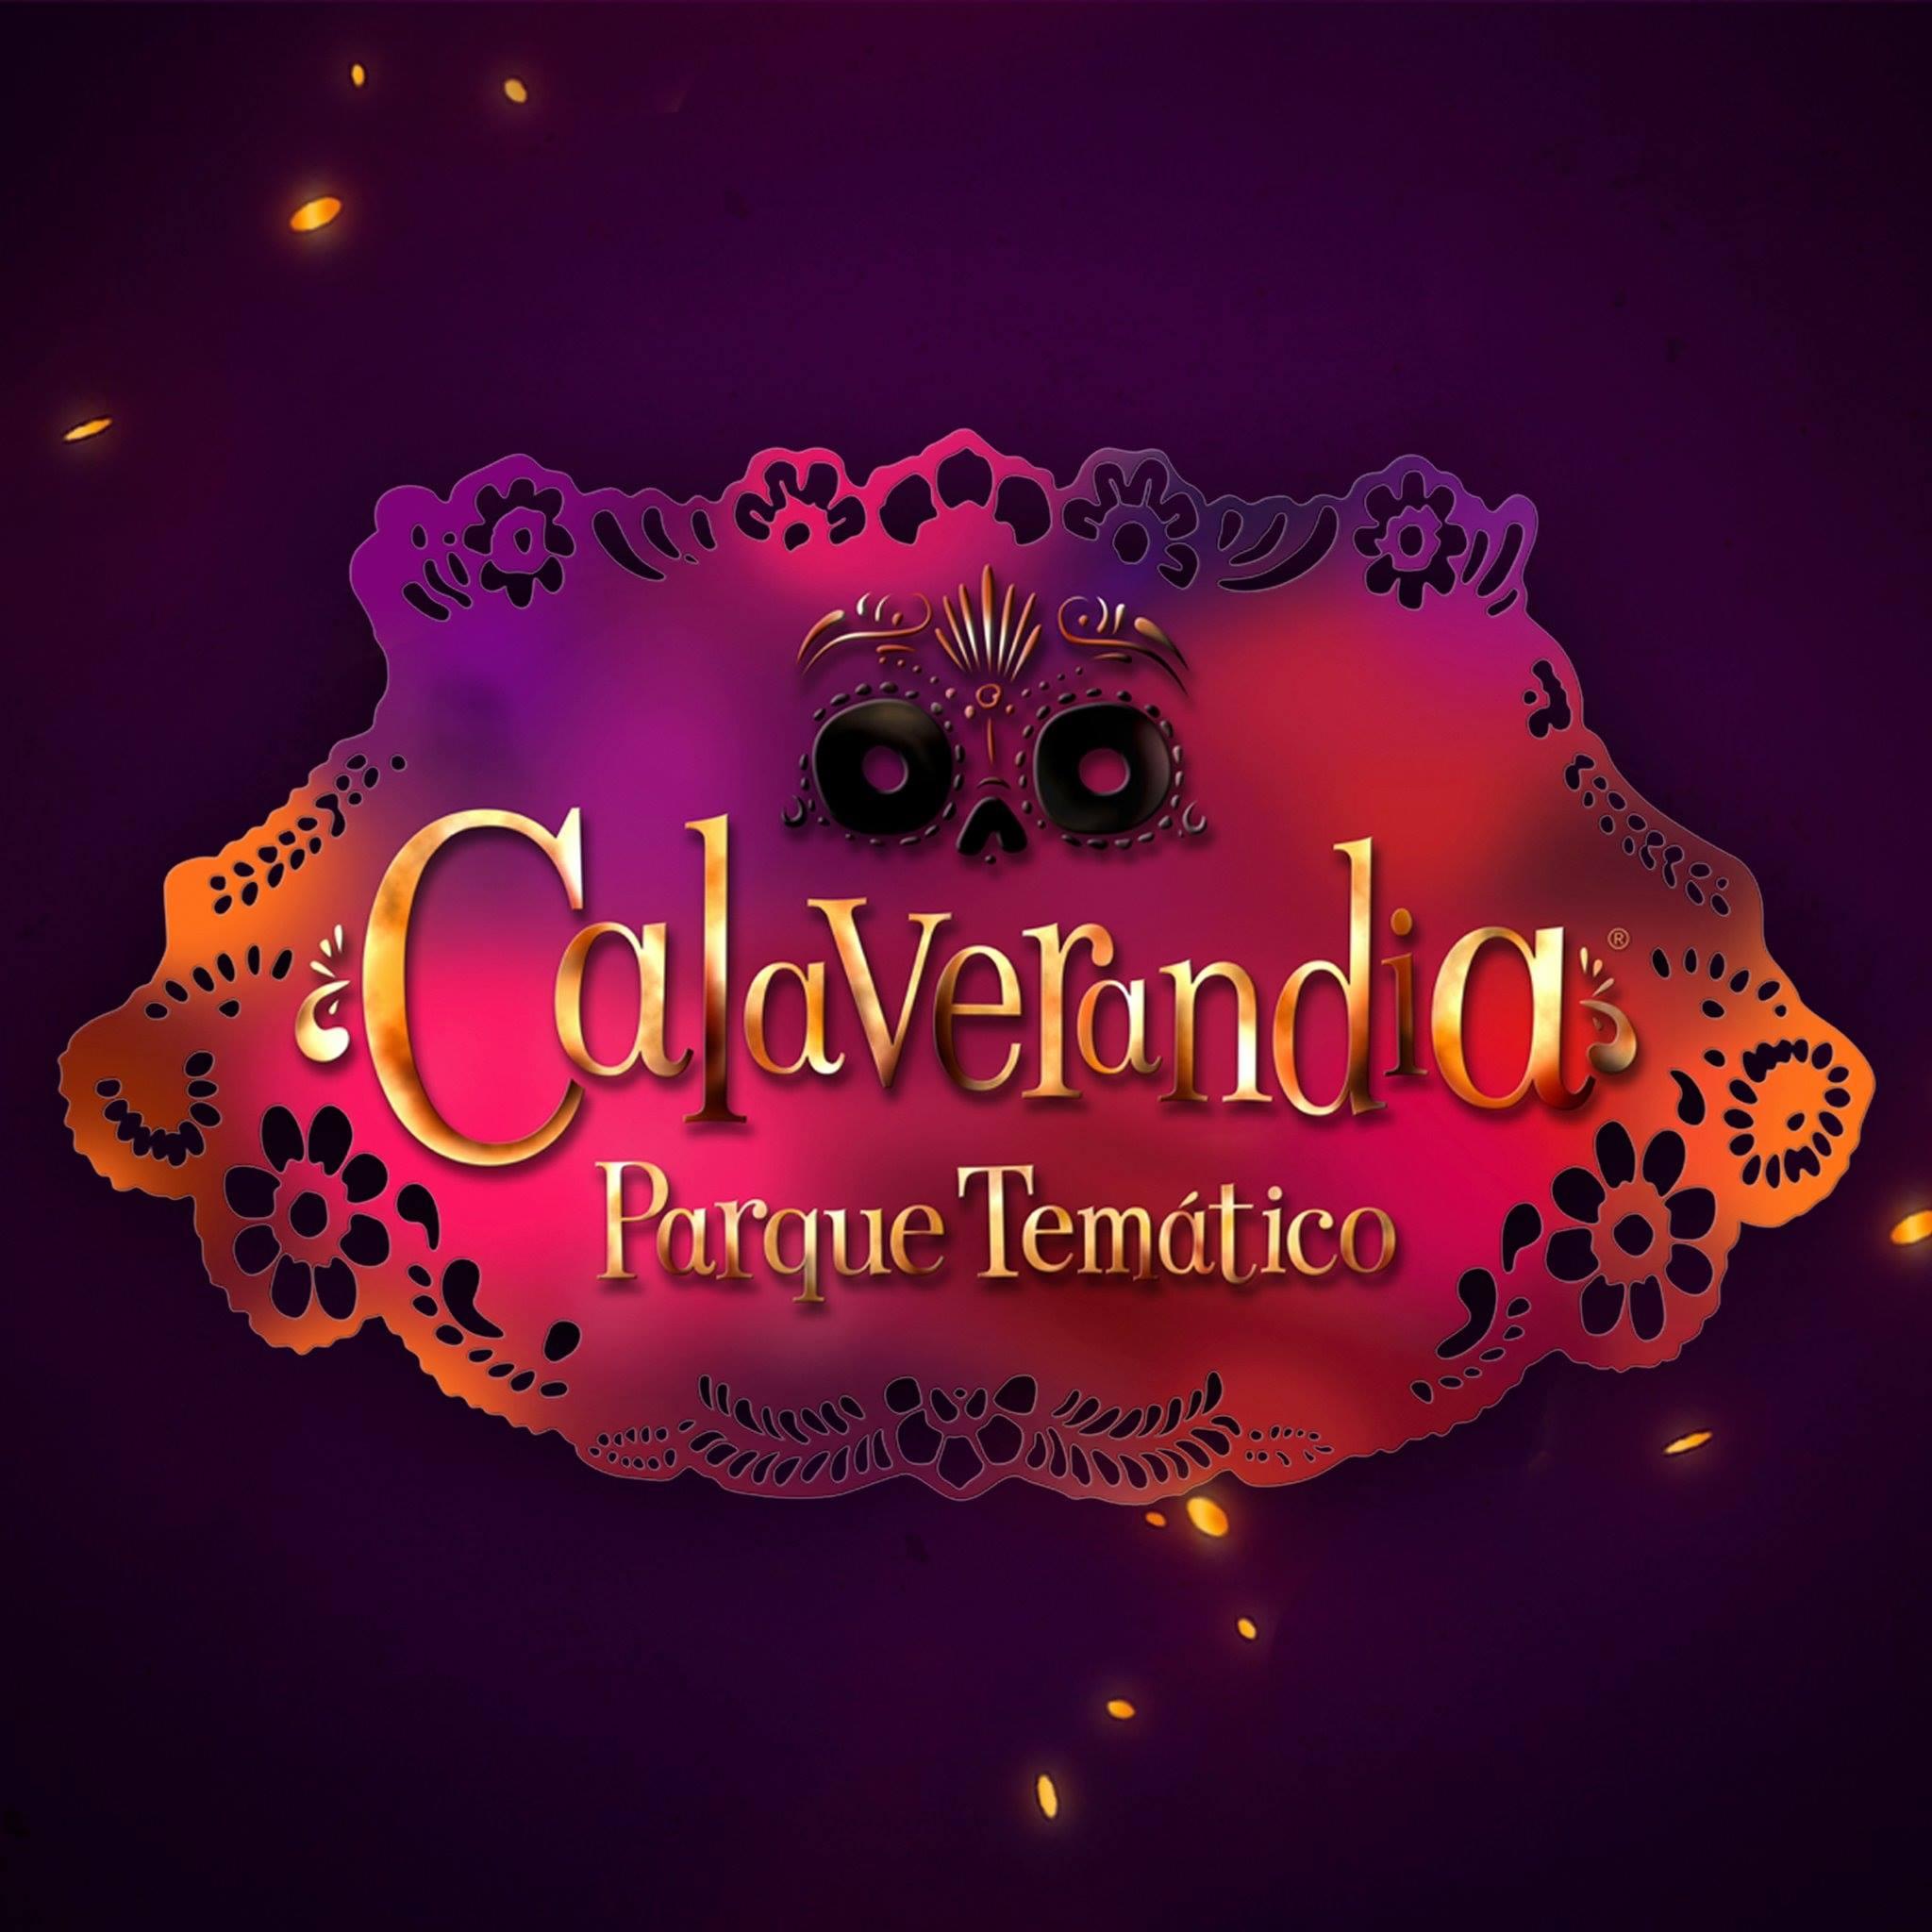 Calaverandia 2019